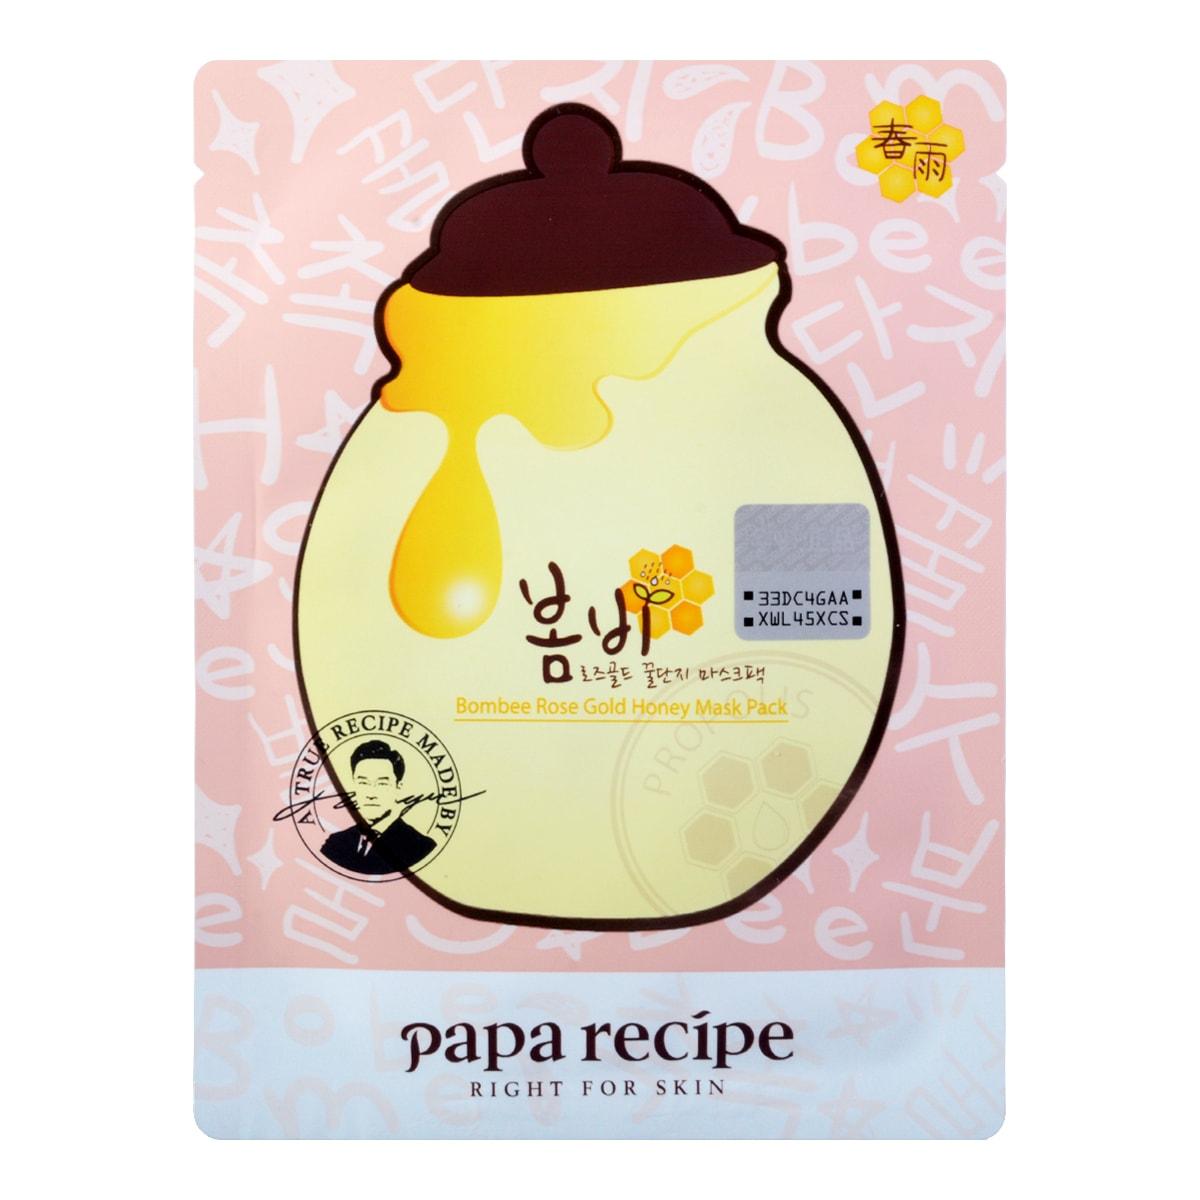 PAPA RECIPE Bombee Rose Gold Honey Mask Pack 1sheet